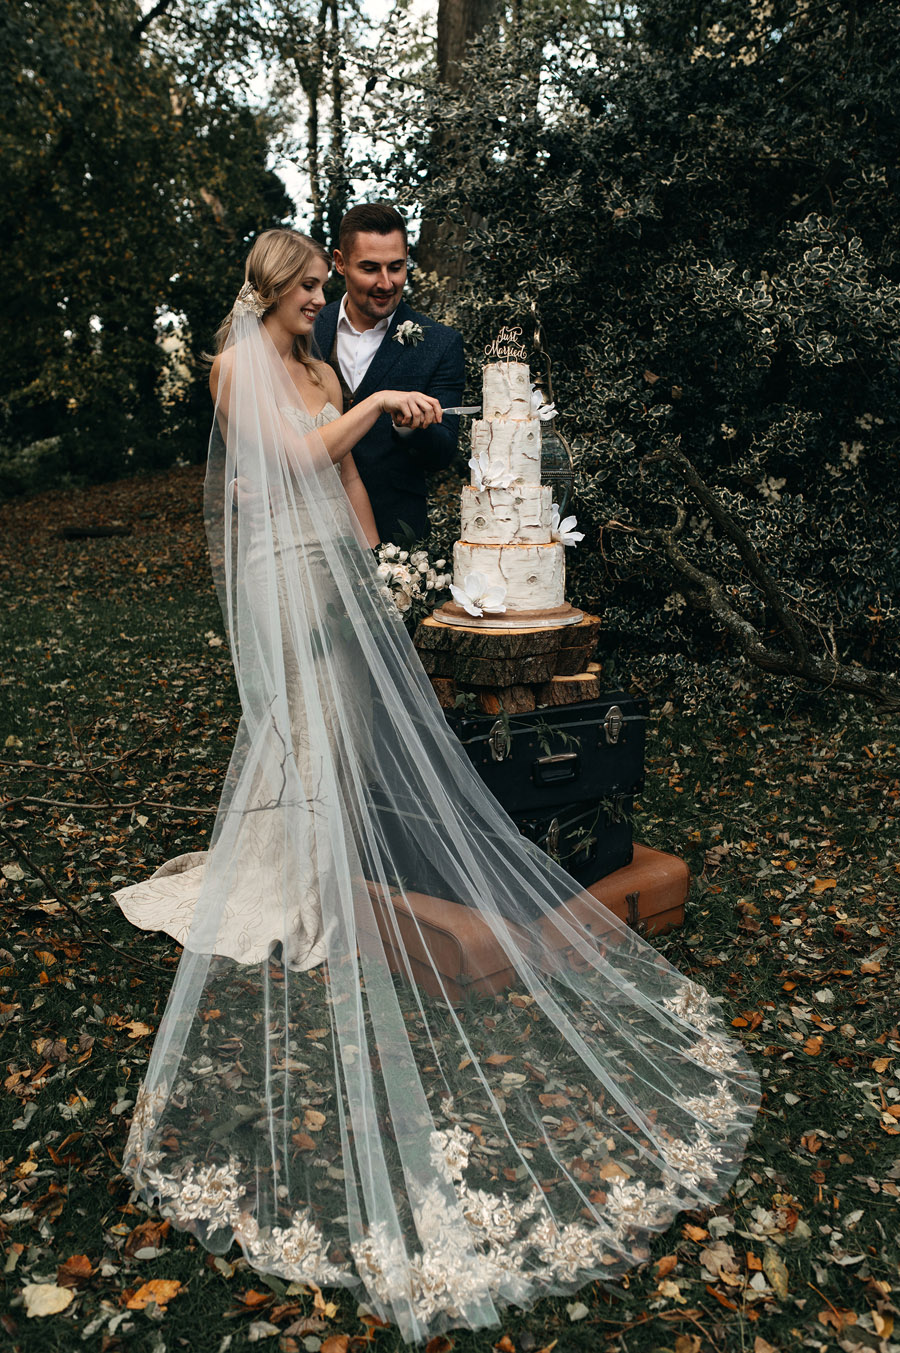 Eco vegan wedding style inspiration with Sanyukta Shrestha, credit KMGS Photography (26)